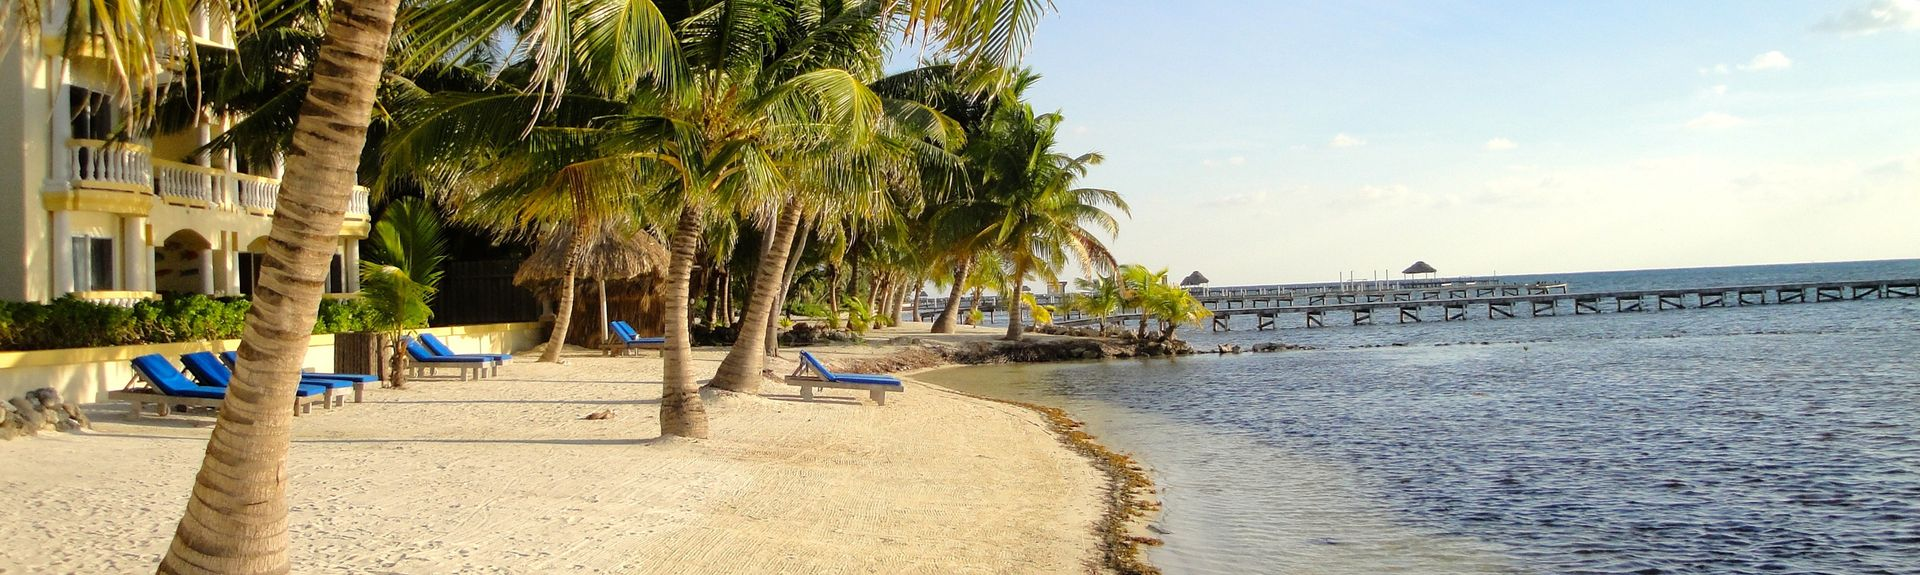 Cayo Ambergris, Distrito de Belize, Belize